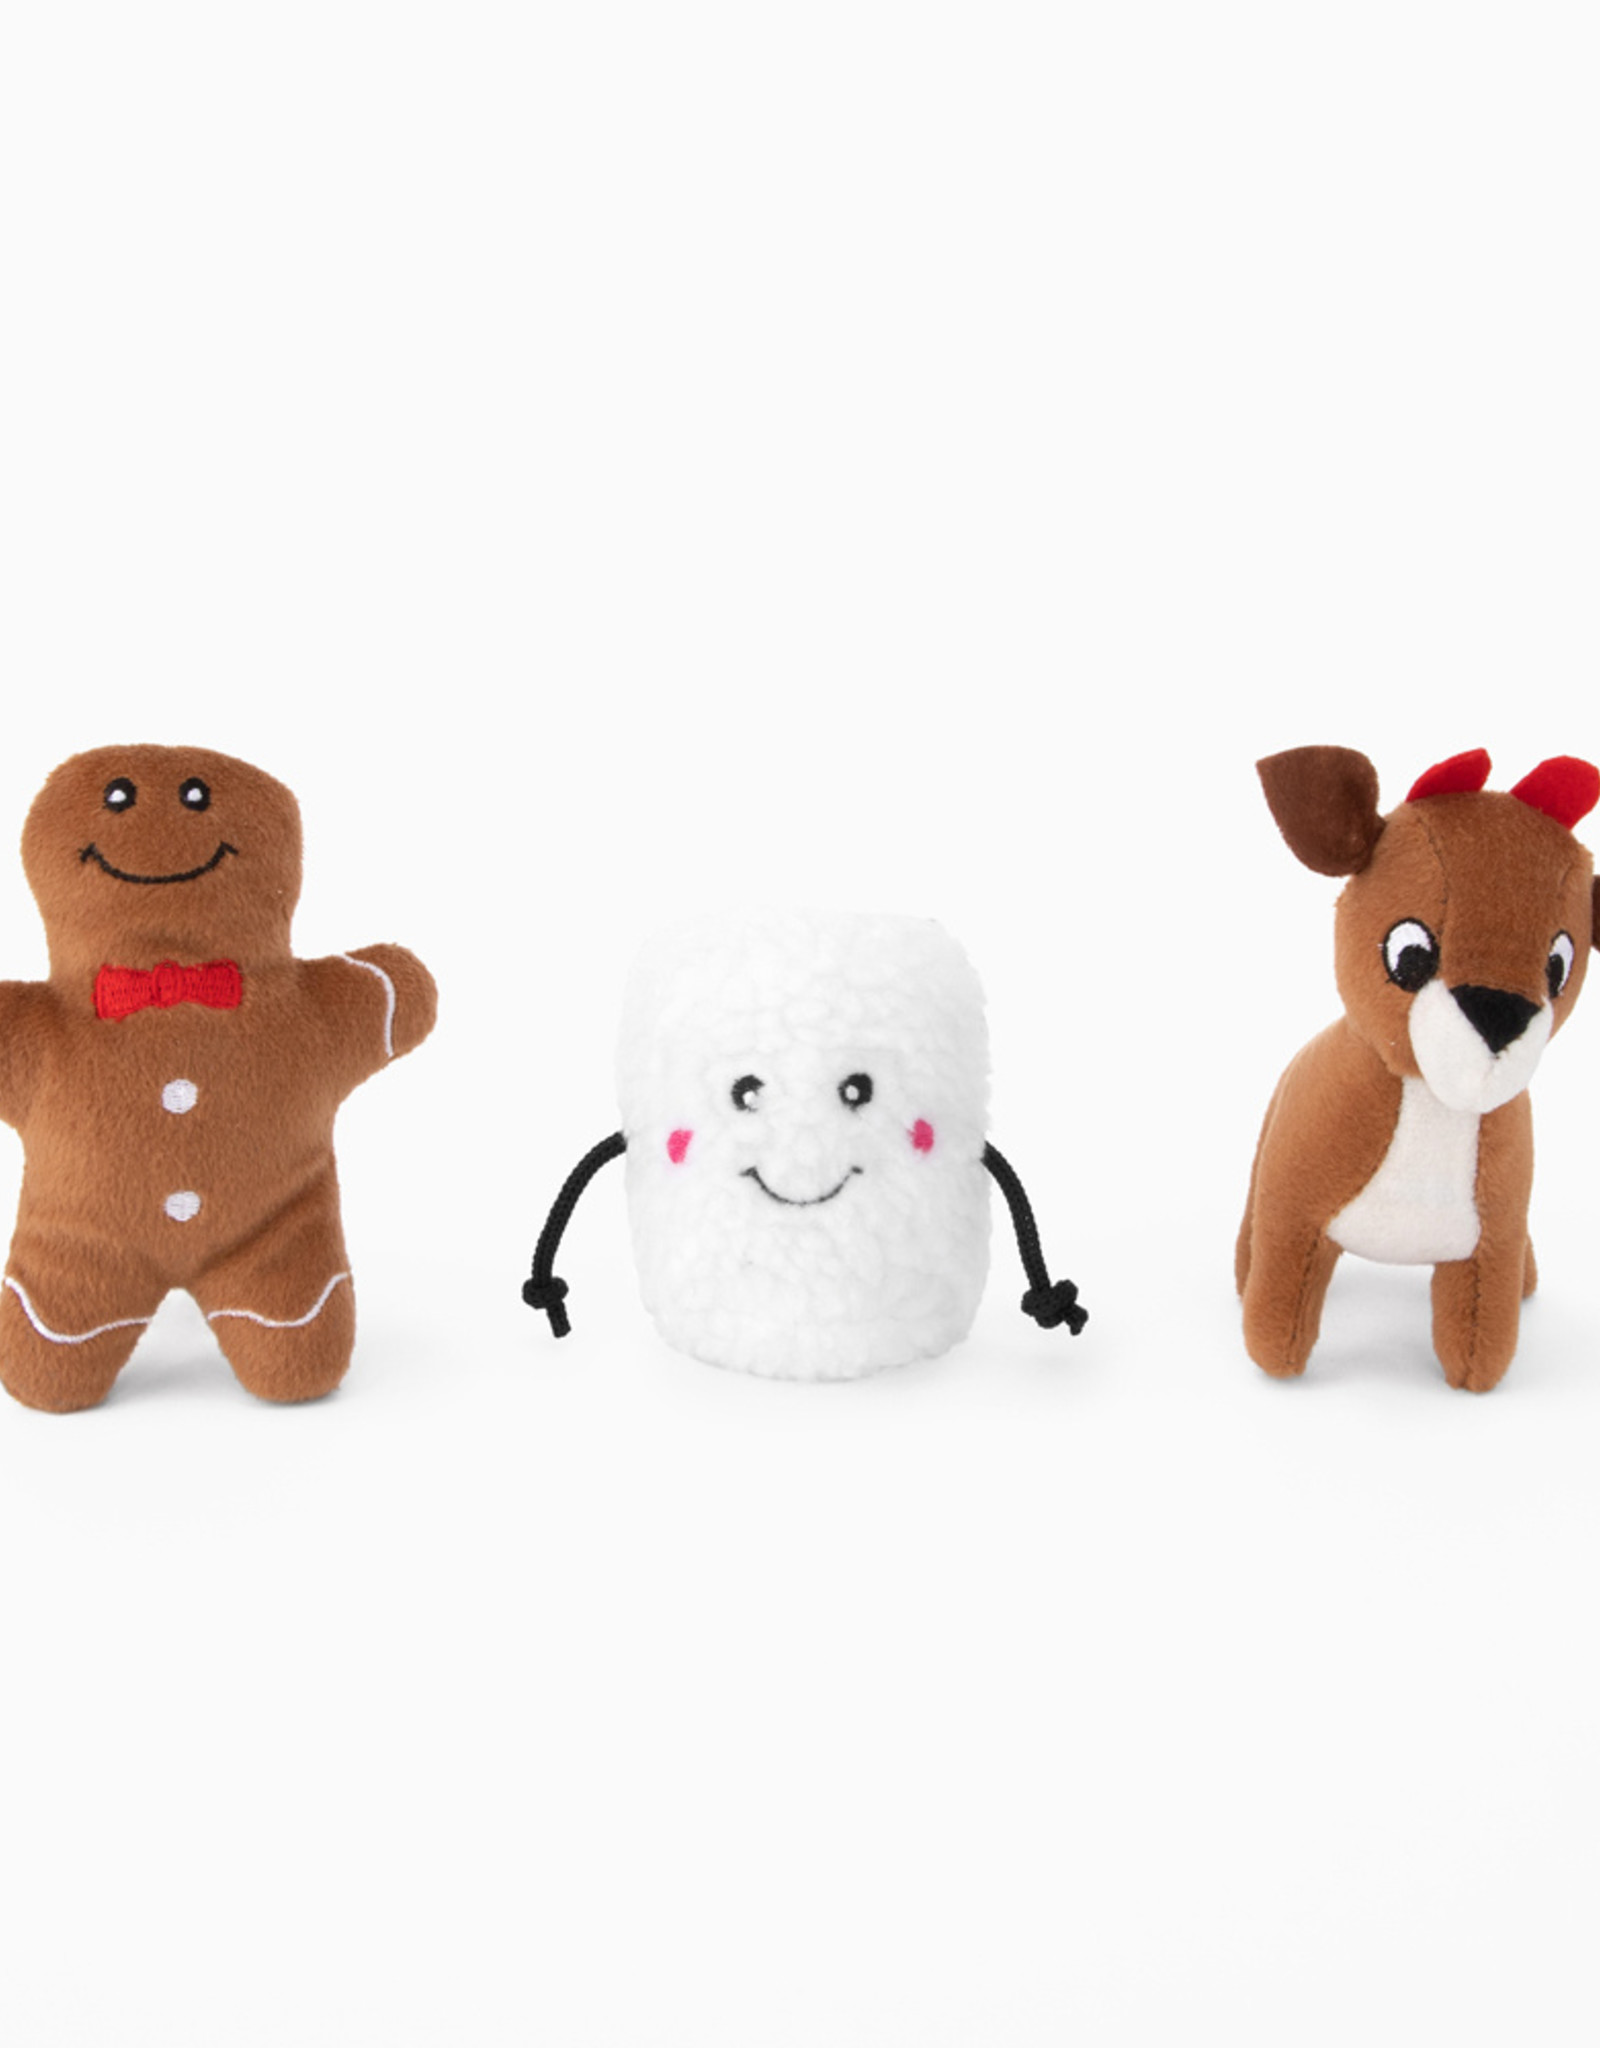 ZippyPaws Holiday Miniz - Santa's Friends 3-Pack